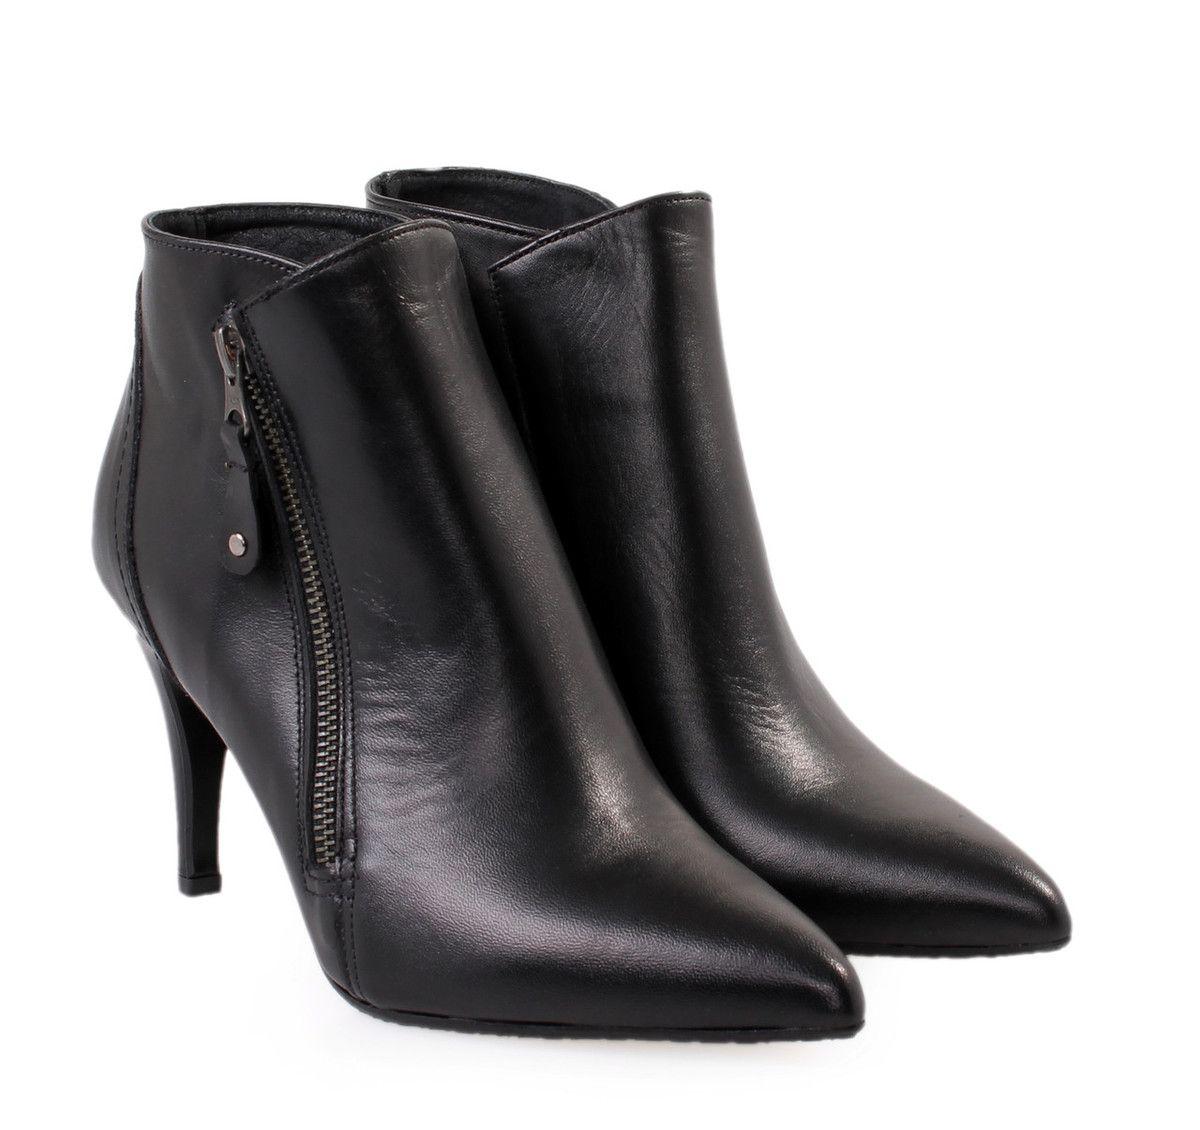 3550a978f20 ΜΠΟΤΑΚΙΑ ΑΣΤΡΑΓΑΛΟΥ ΔΕΡΜΑΤΙΝΑ SAGIAKOS (BLACK) | shoes | Shoes ...